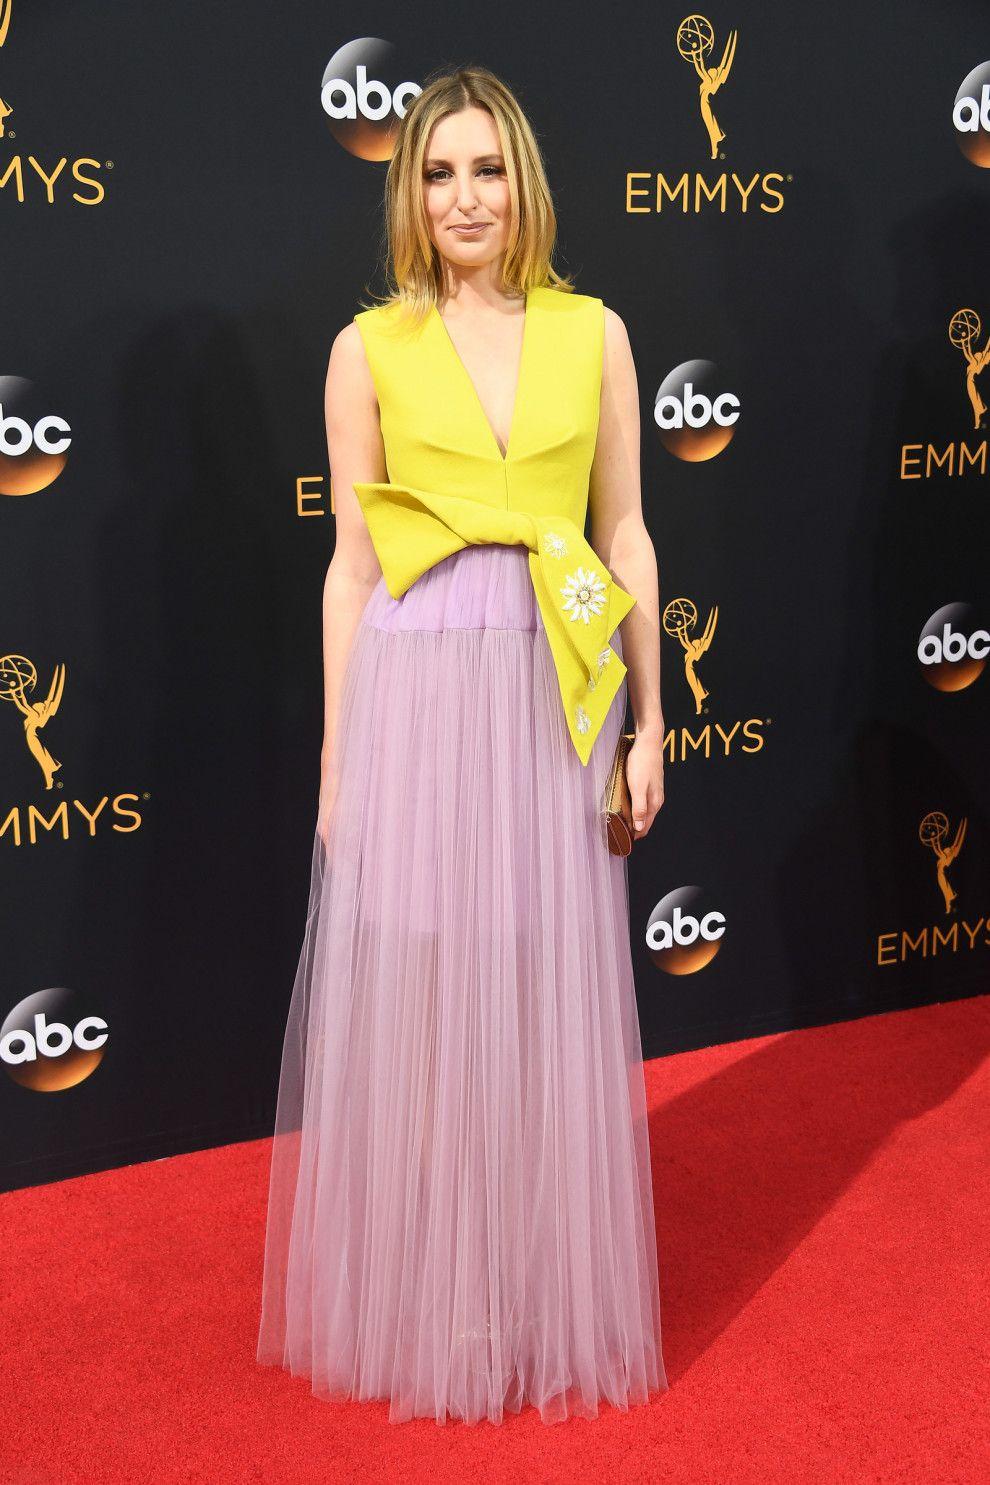 Todos os looks do Emmy 2016 | Red carpet fashion, Dresses, Delpozo dress